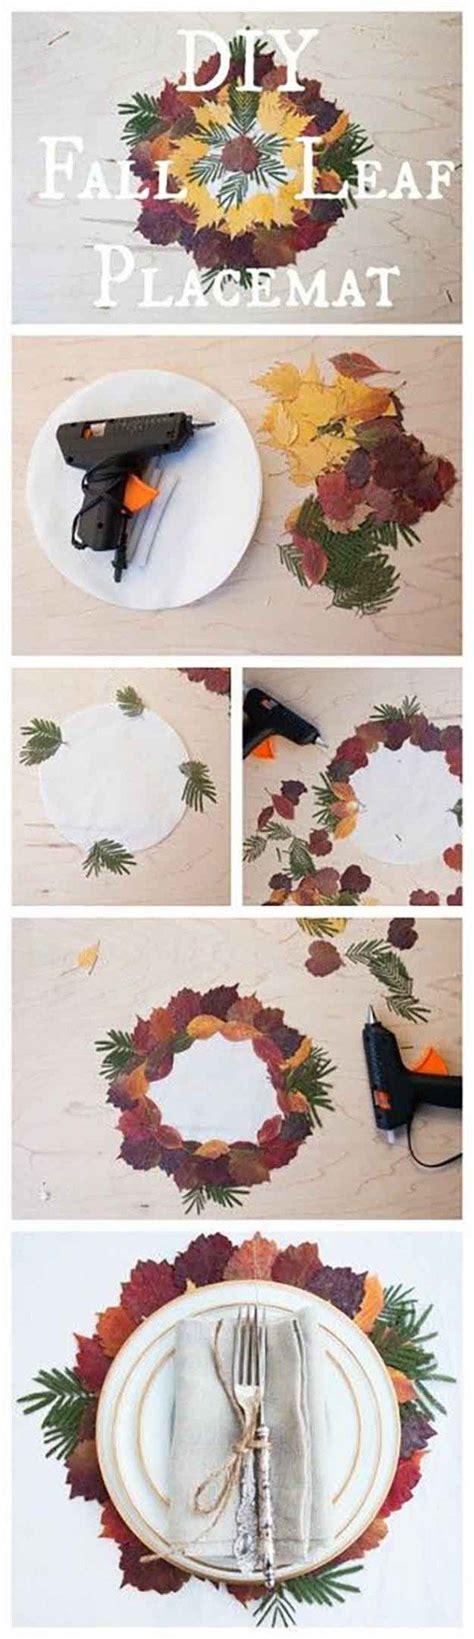 thanksgiving decorations 14 diy placemat ideas